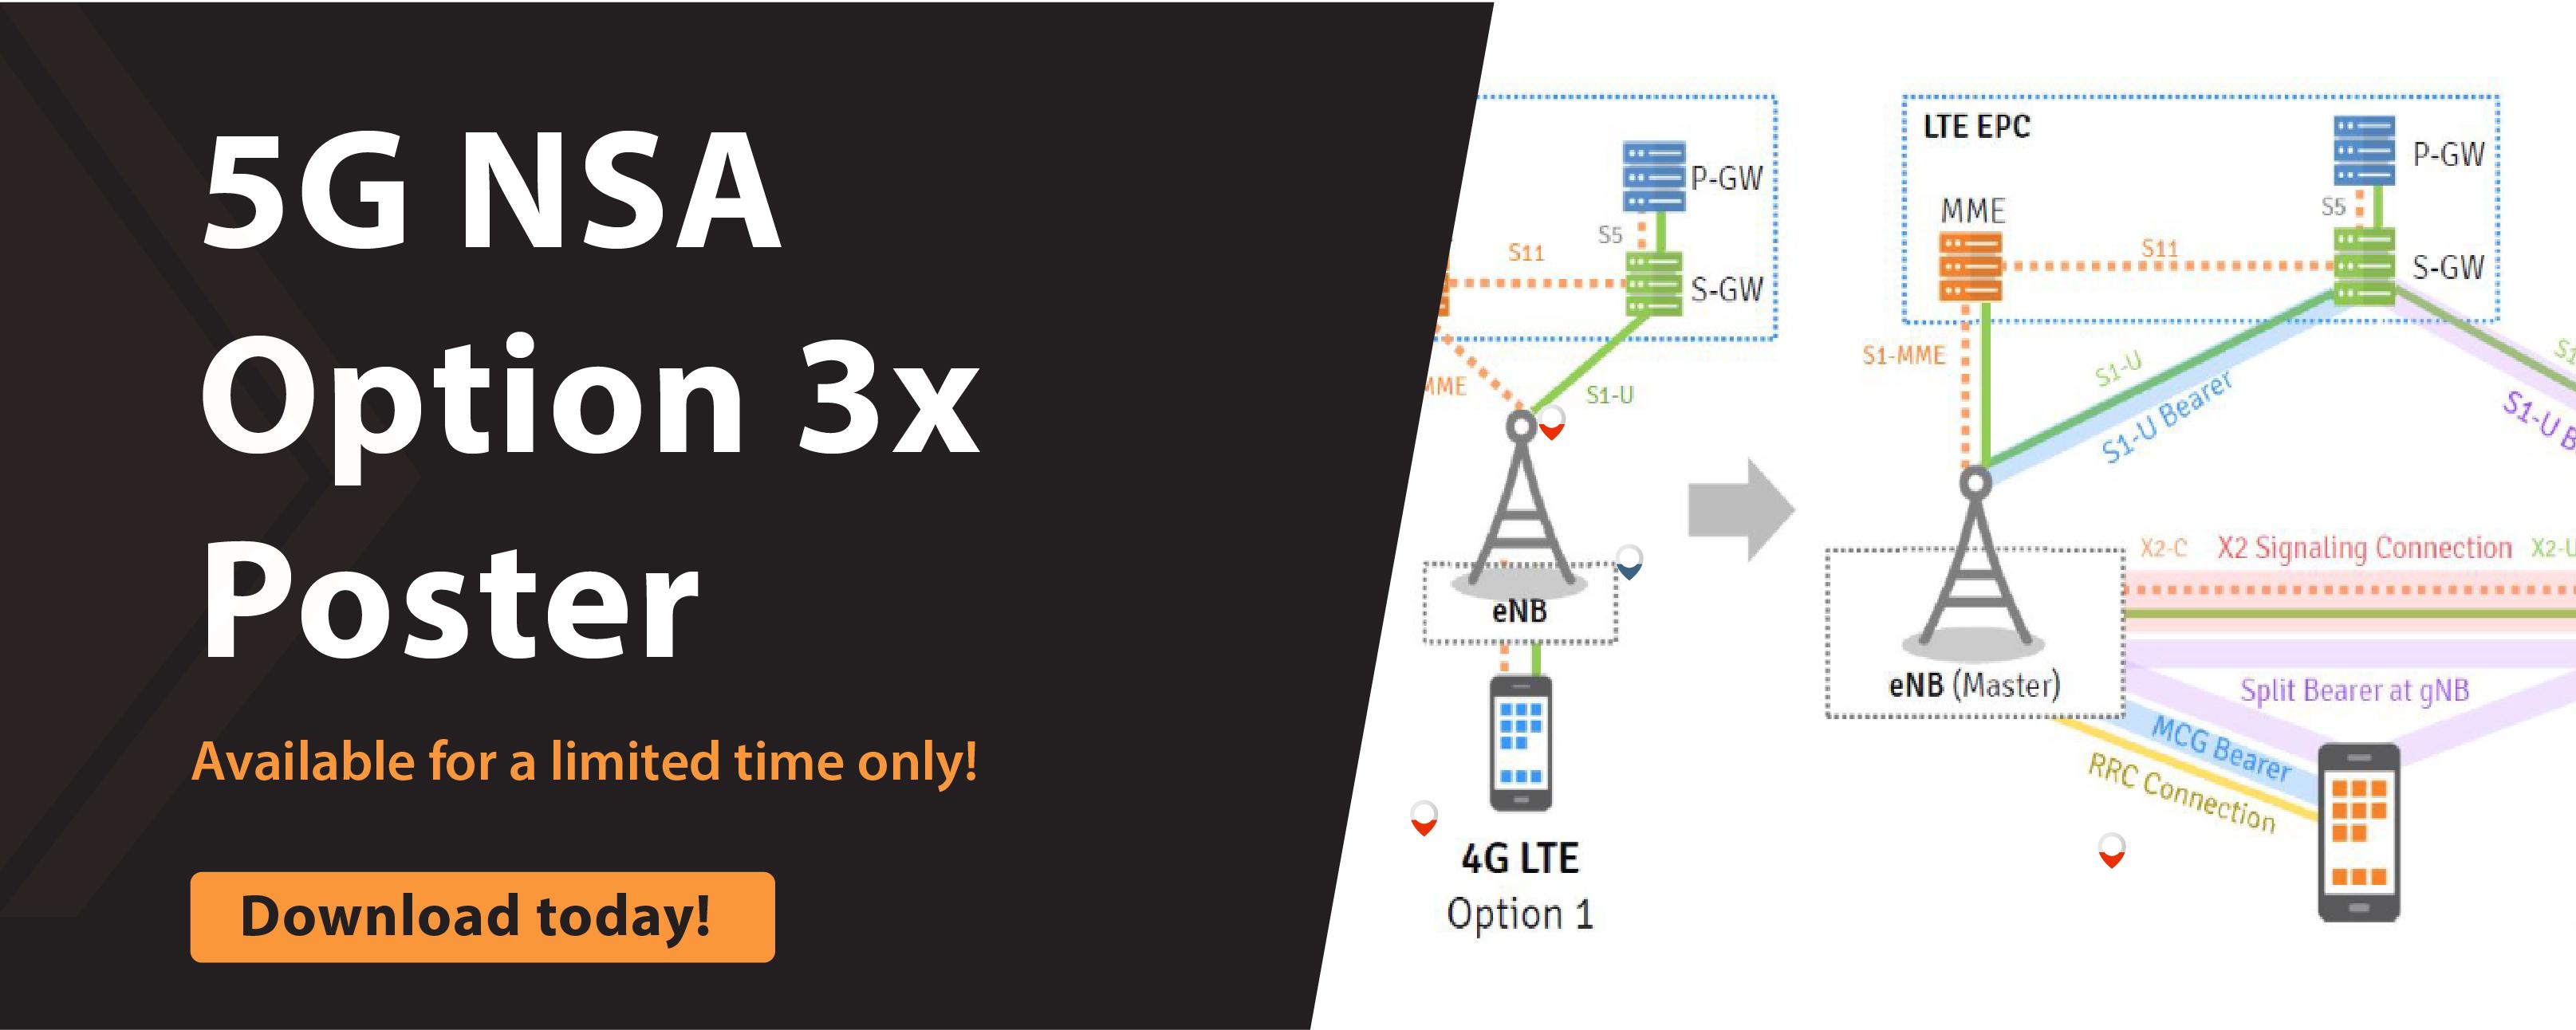 5G NSA Options 3x 775 x 310 v3-01.jpg